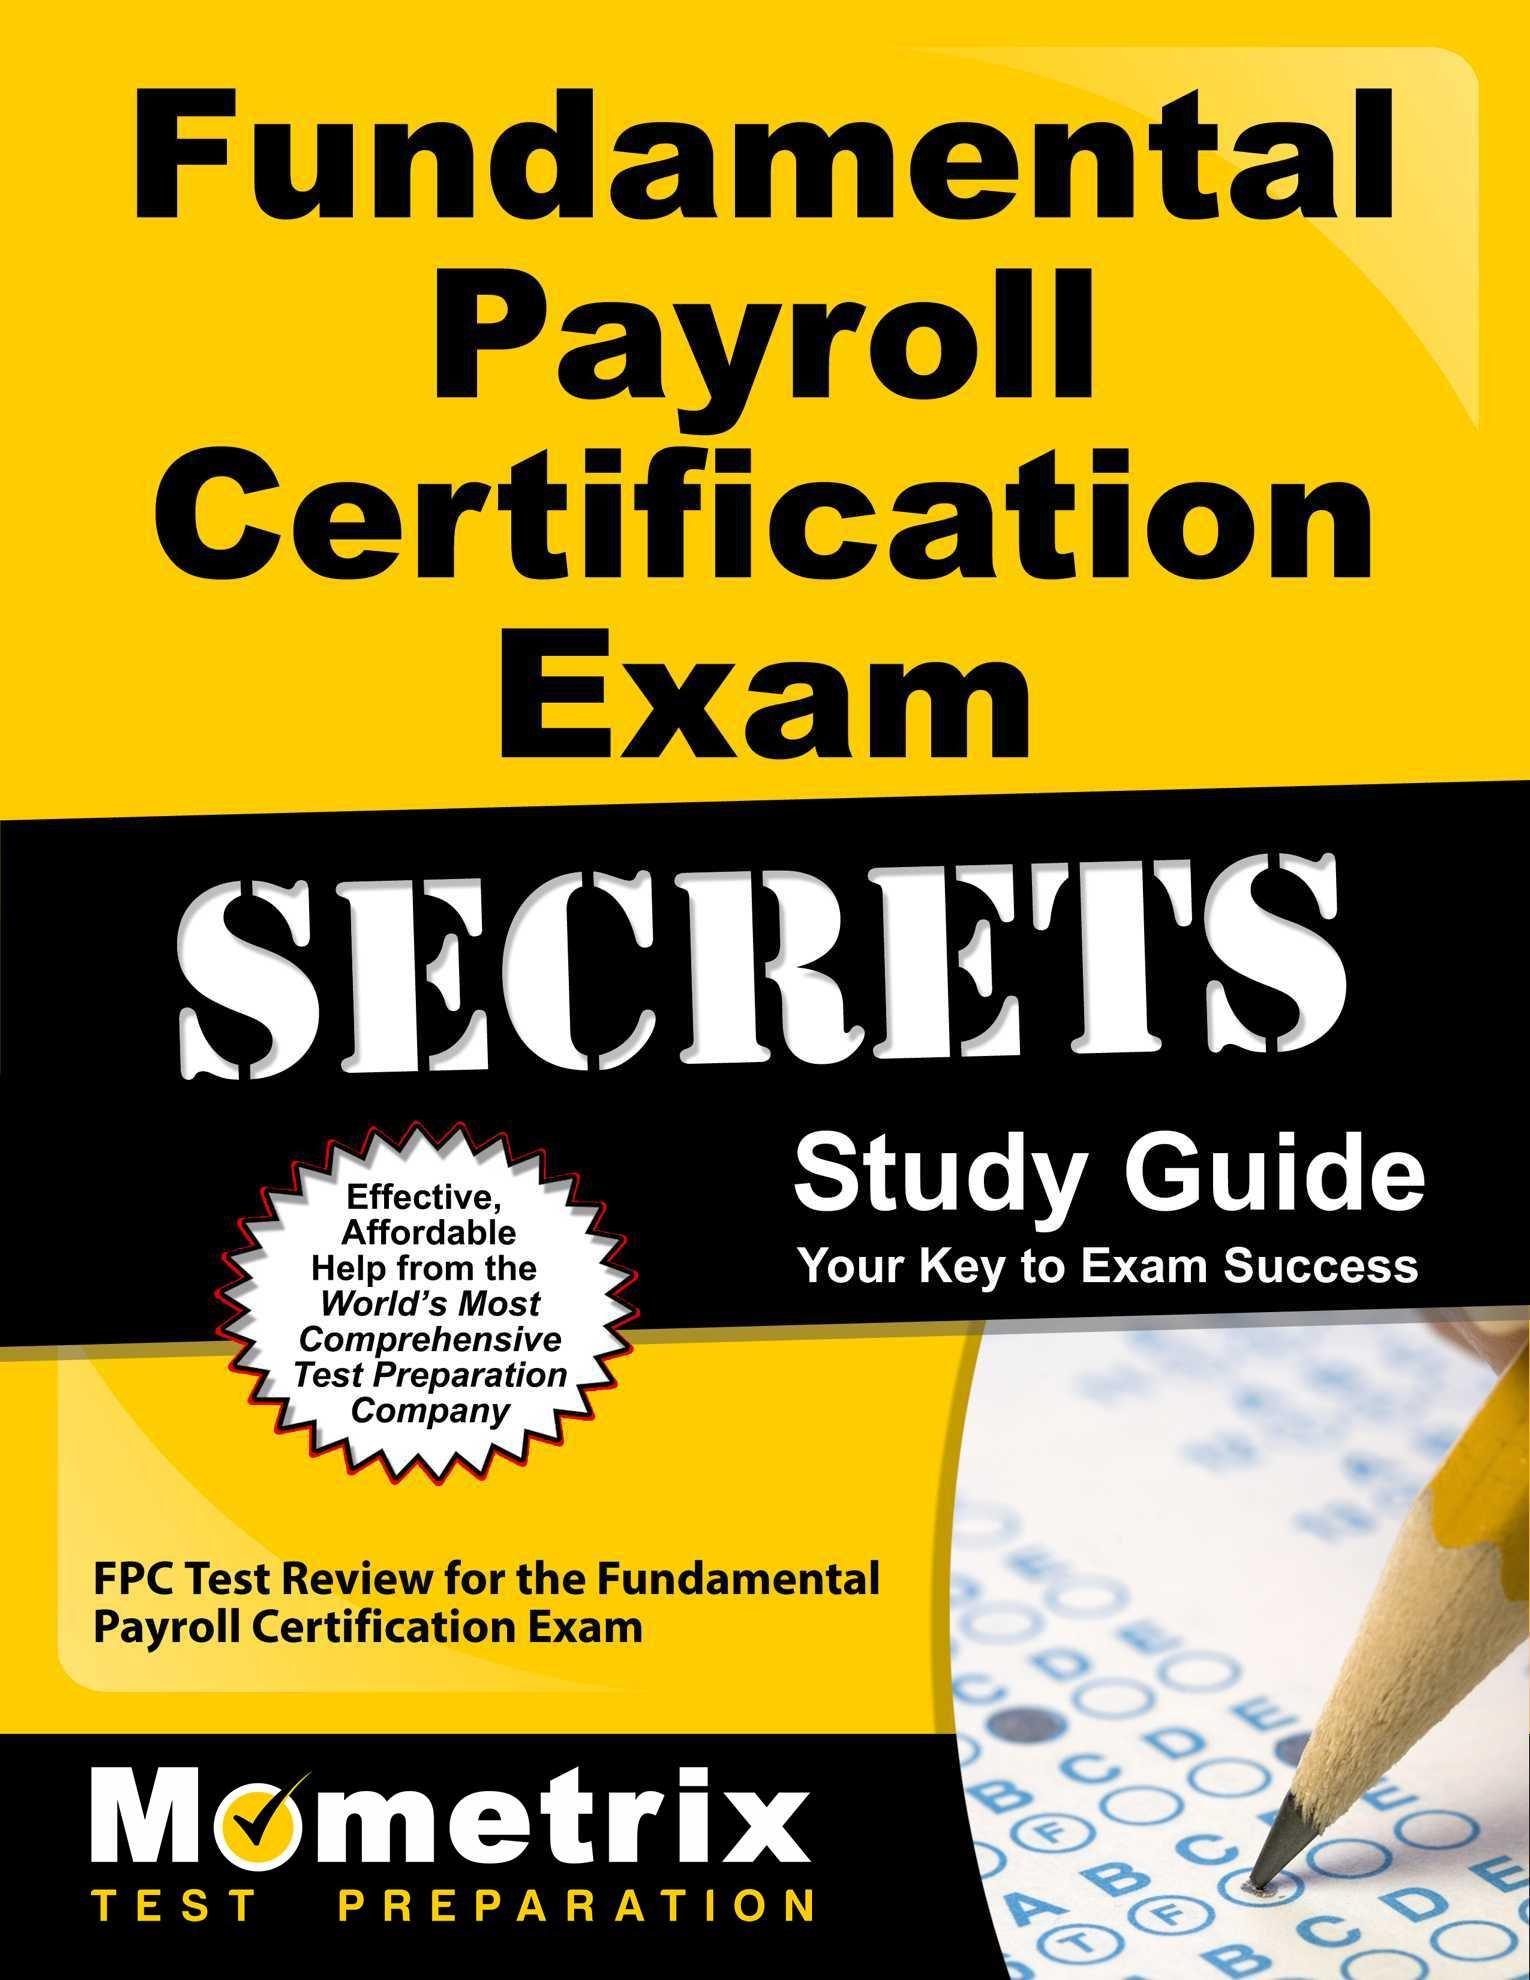 Buy Fundamental Payroll Certification Exam Secrets Fpc Test Review